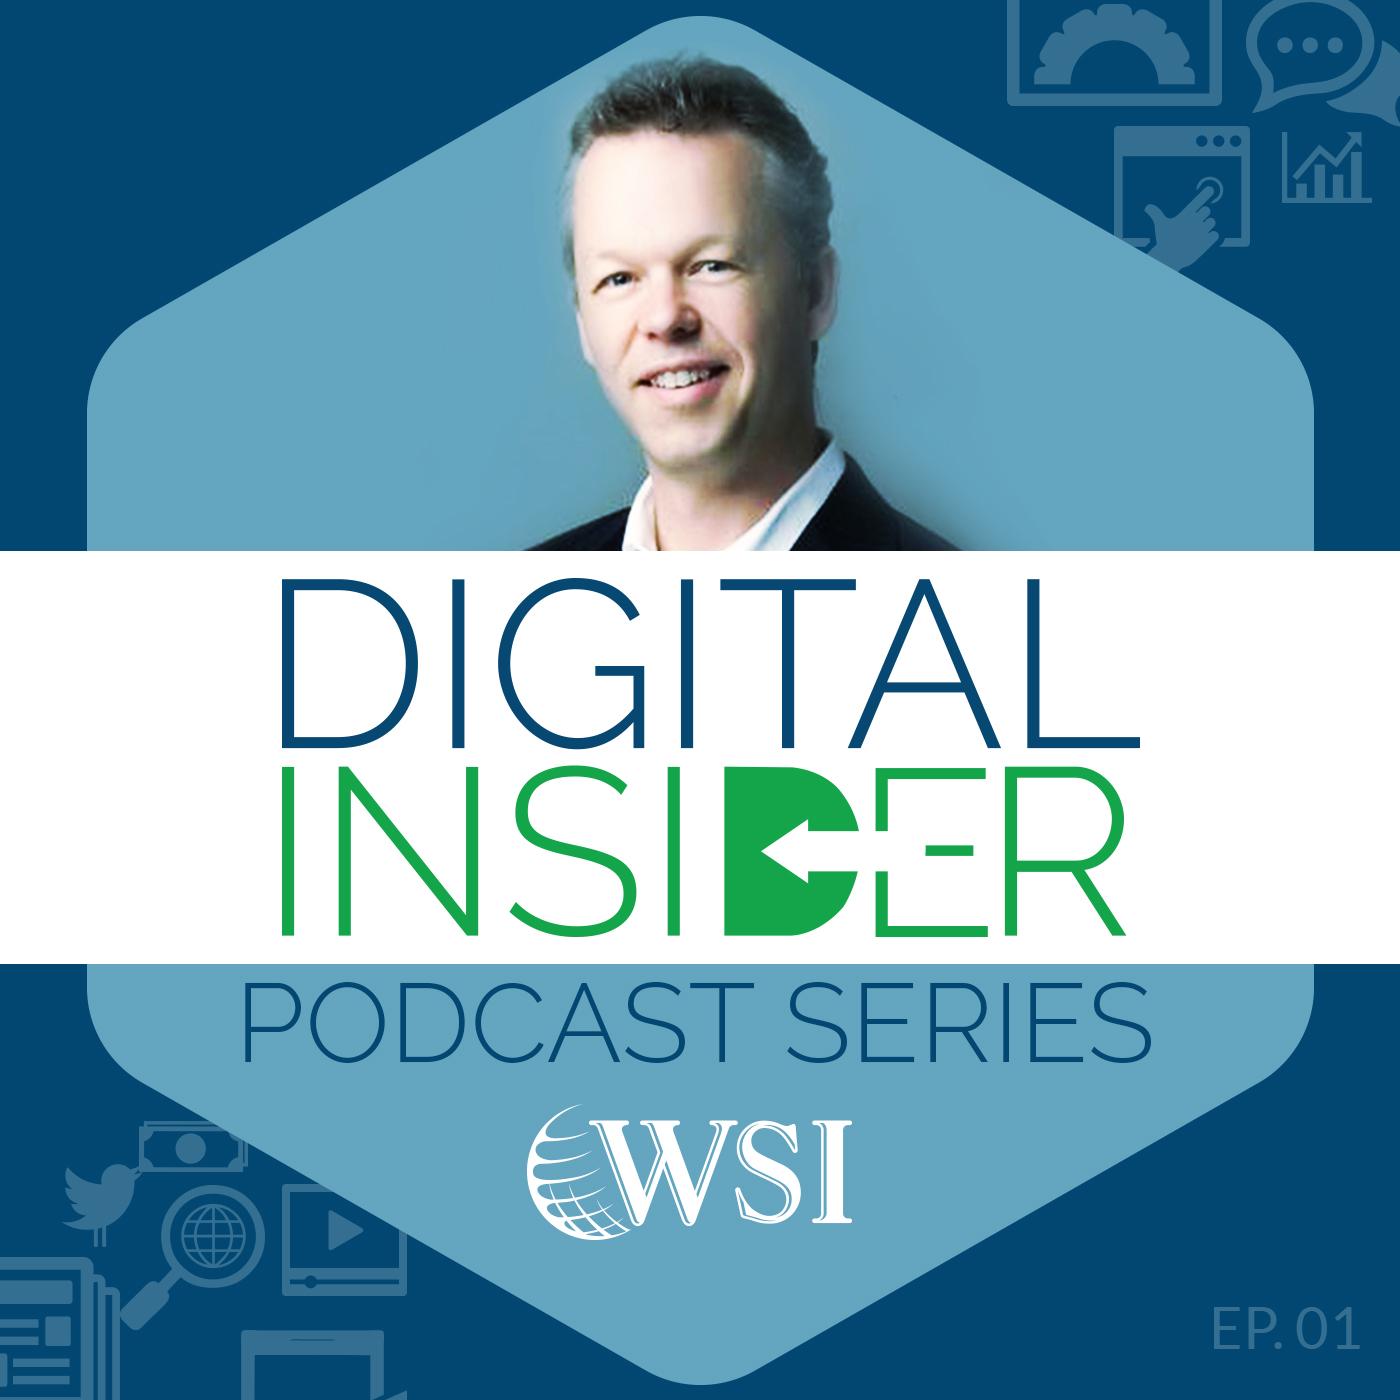 Episode 1: Digital Marketing Strategies with Dan Monaghan